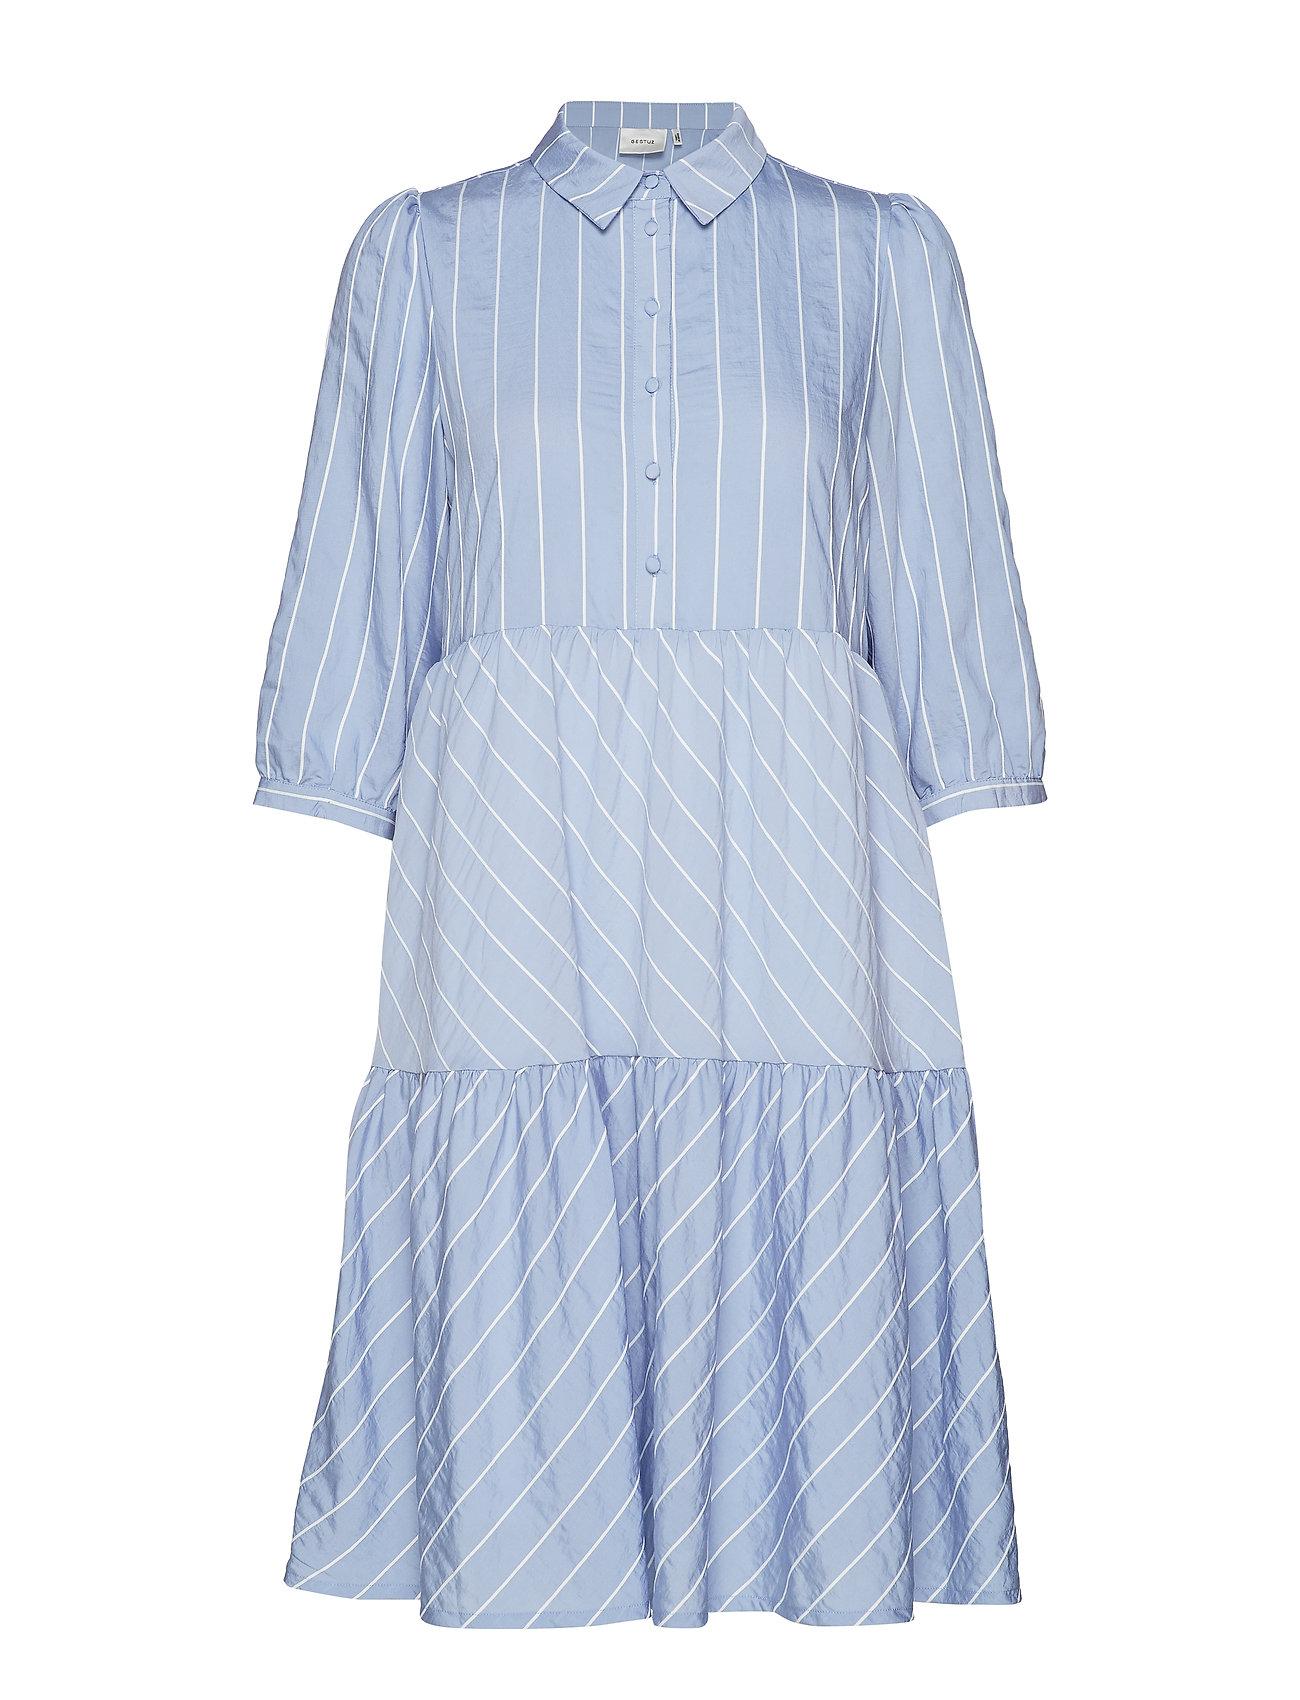 Gestuz TuanGZ short dress ZE2 19 - BLUE/WHITE STRIPES